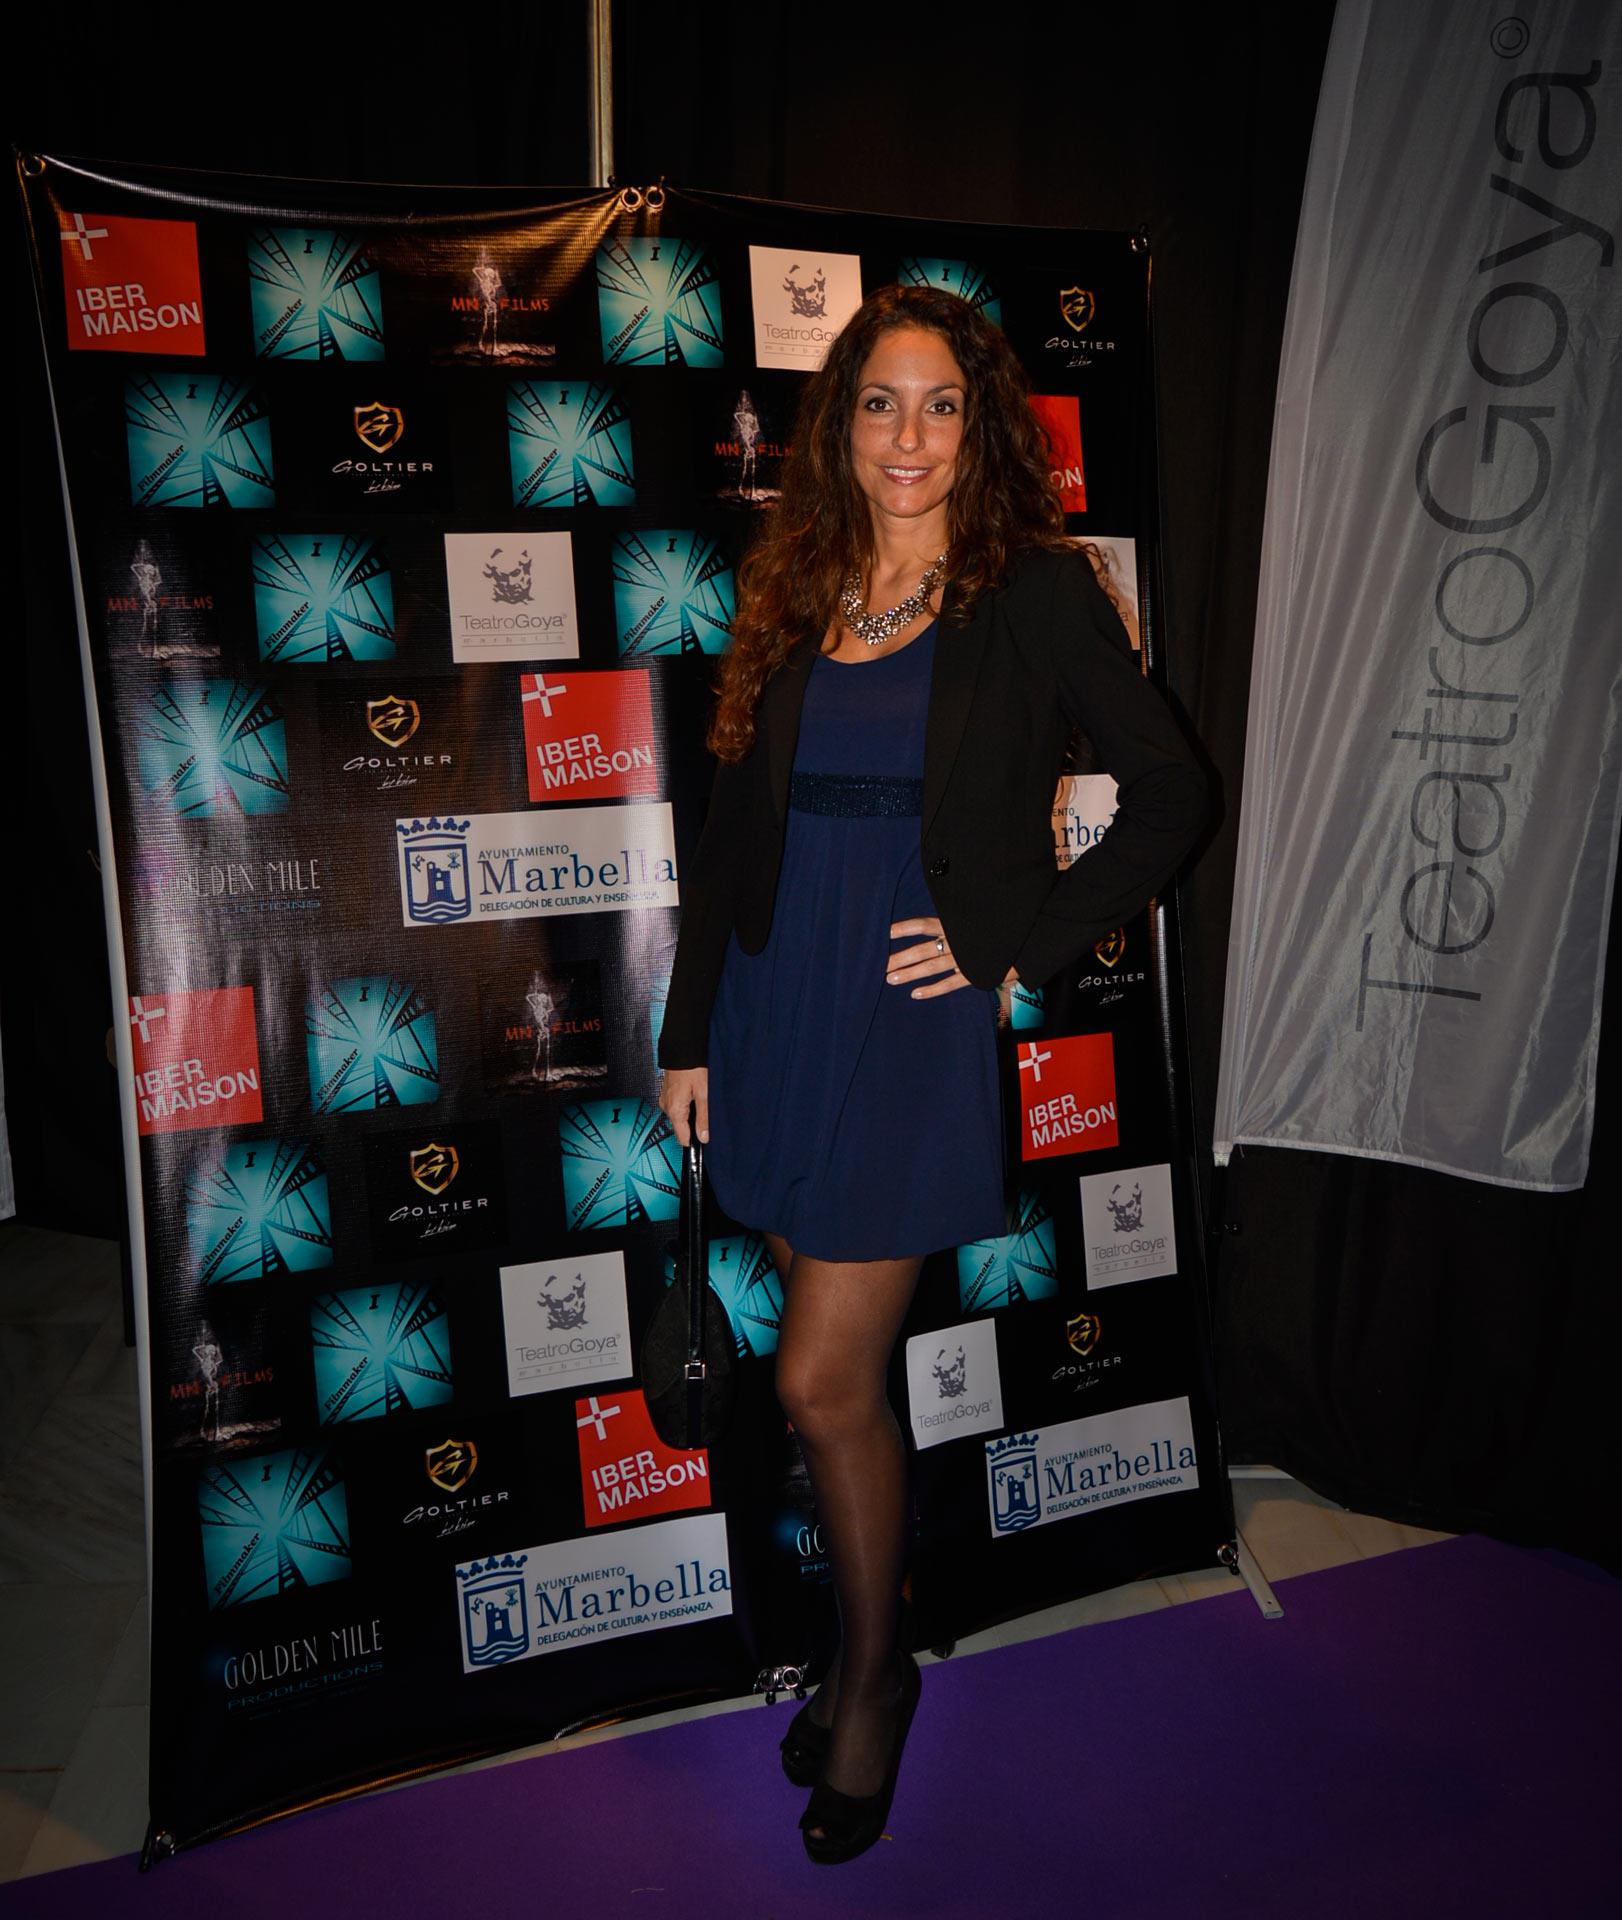 I filmmaker international film festival ariana soffici - Cine goya puerto banus ...